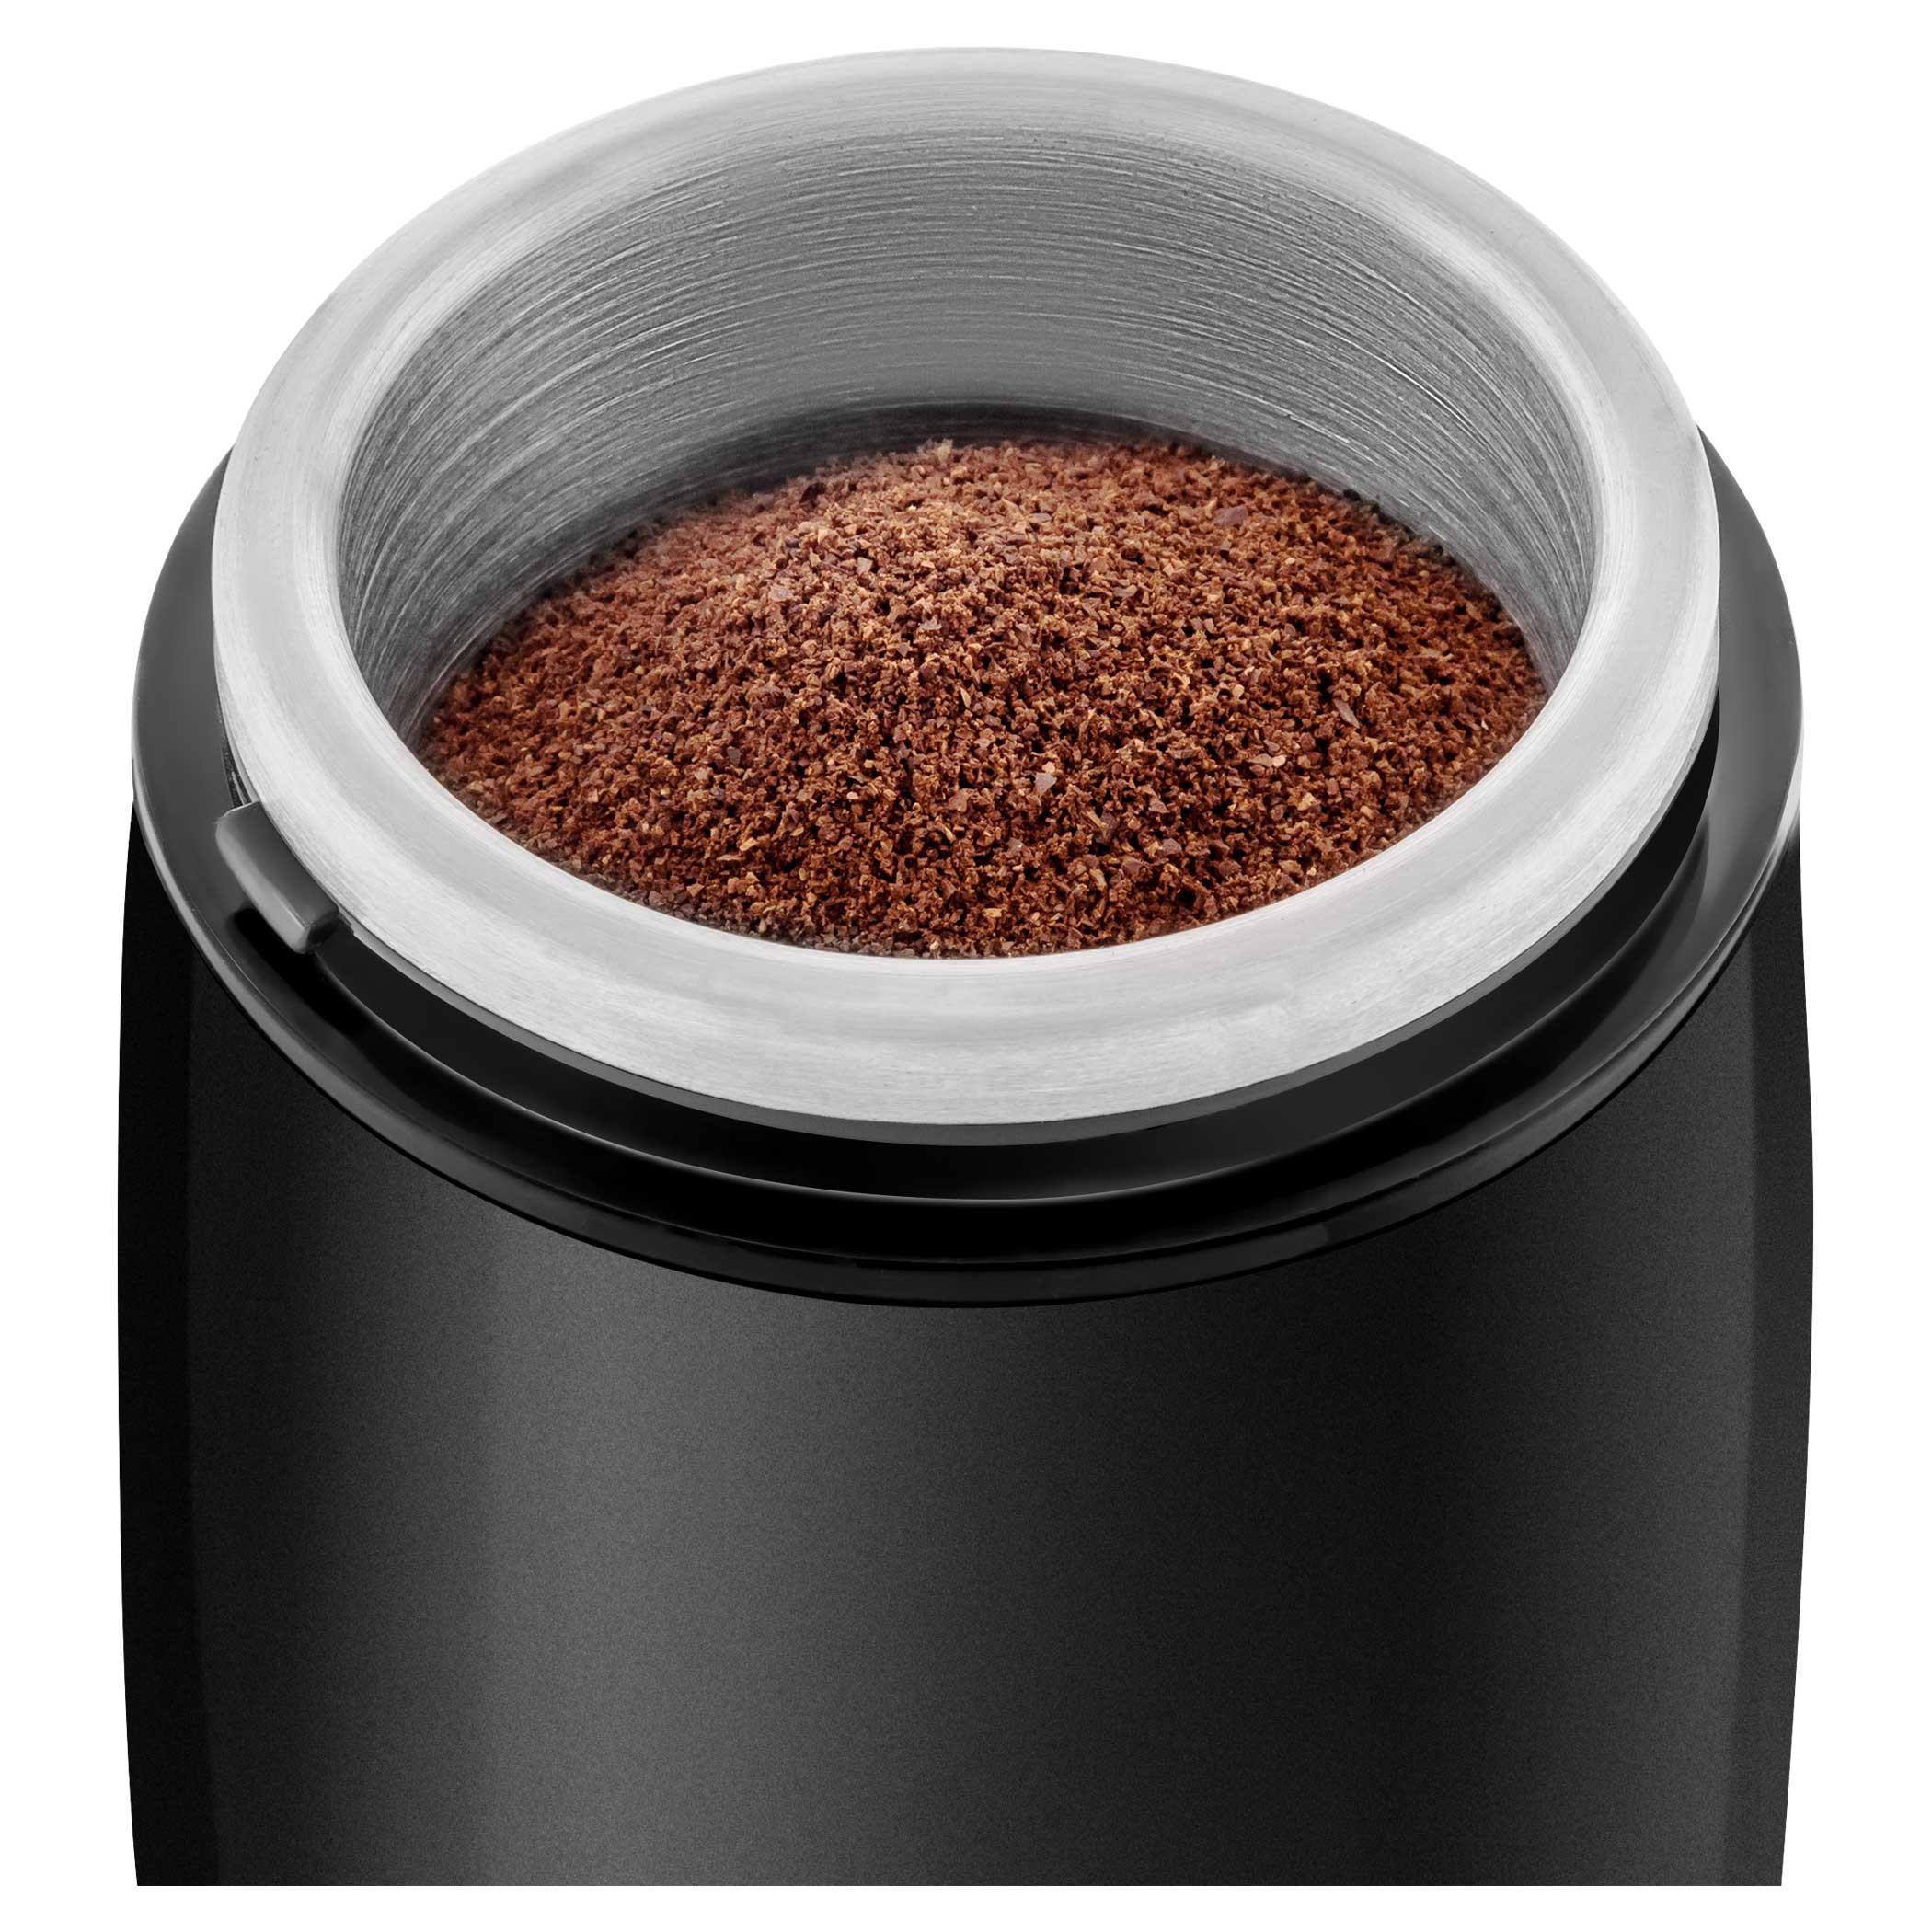 Coffee grinder Sencor SCG2051BK